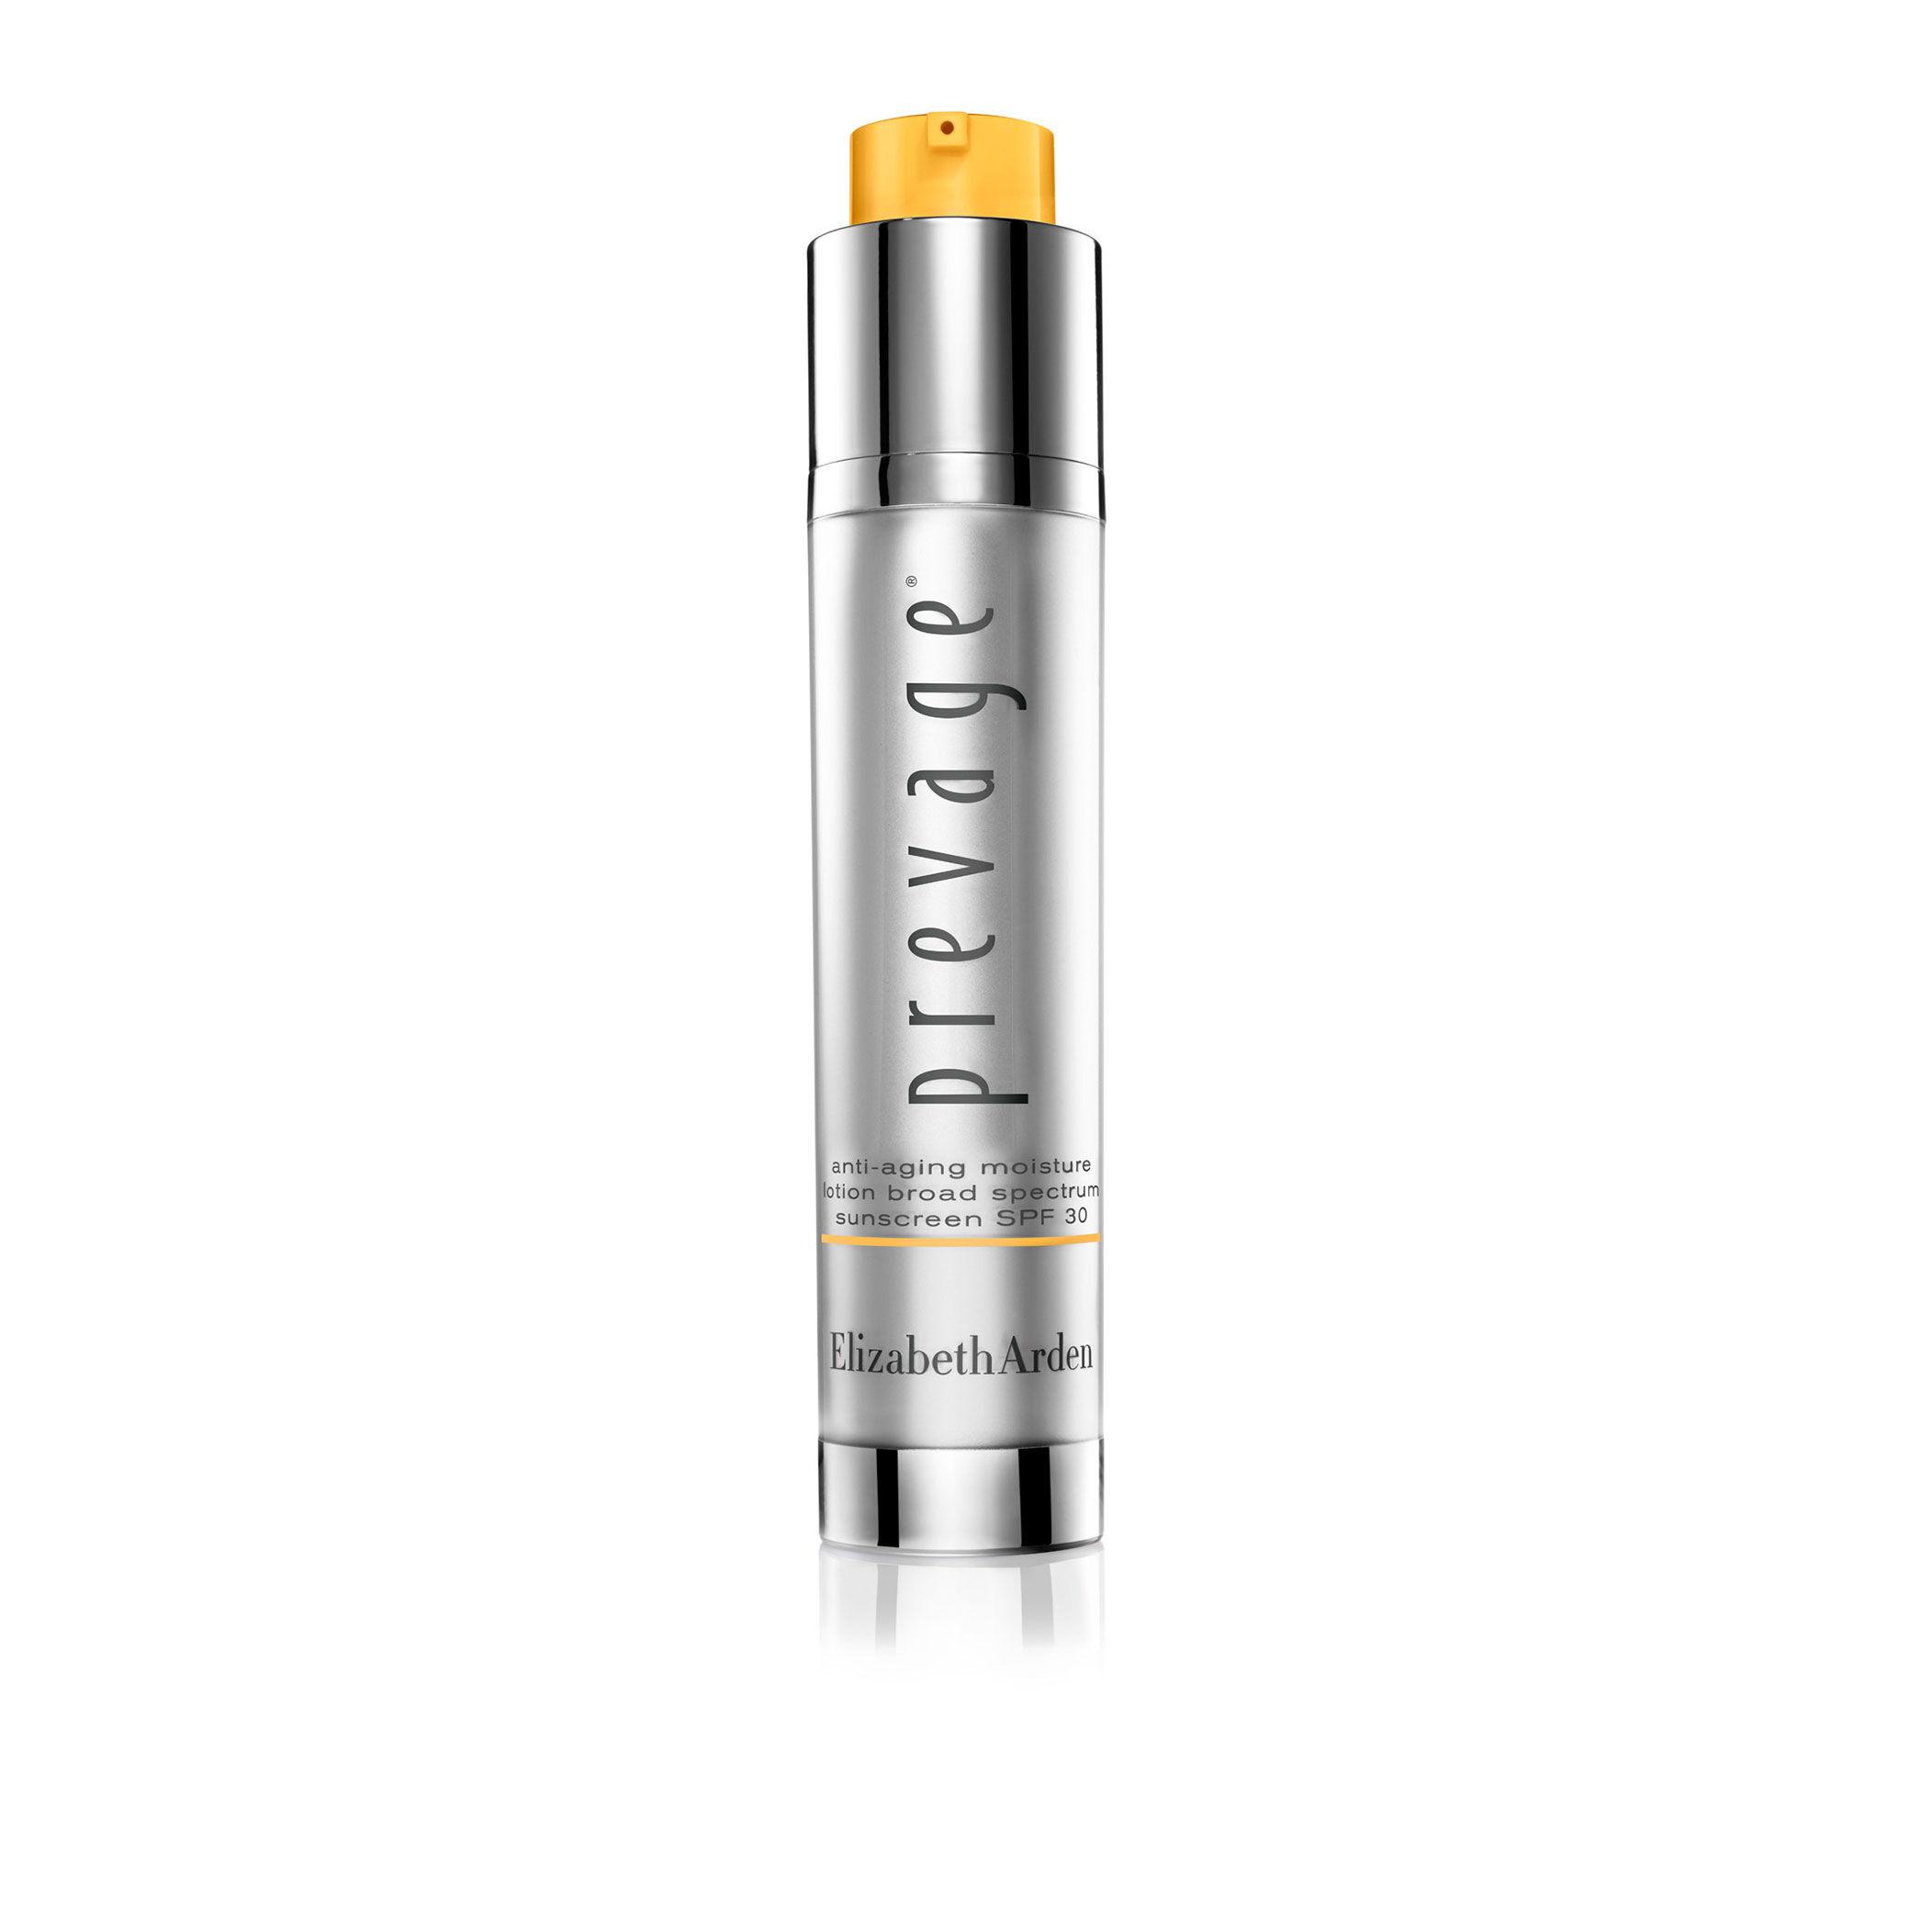 PREVAGE Anti-Aging Moisture Lotion Broad Spectrum Sunscreen SPF 30